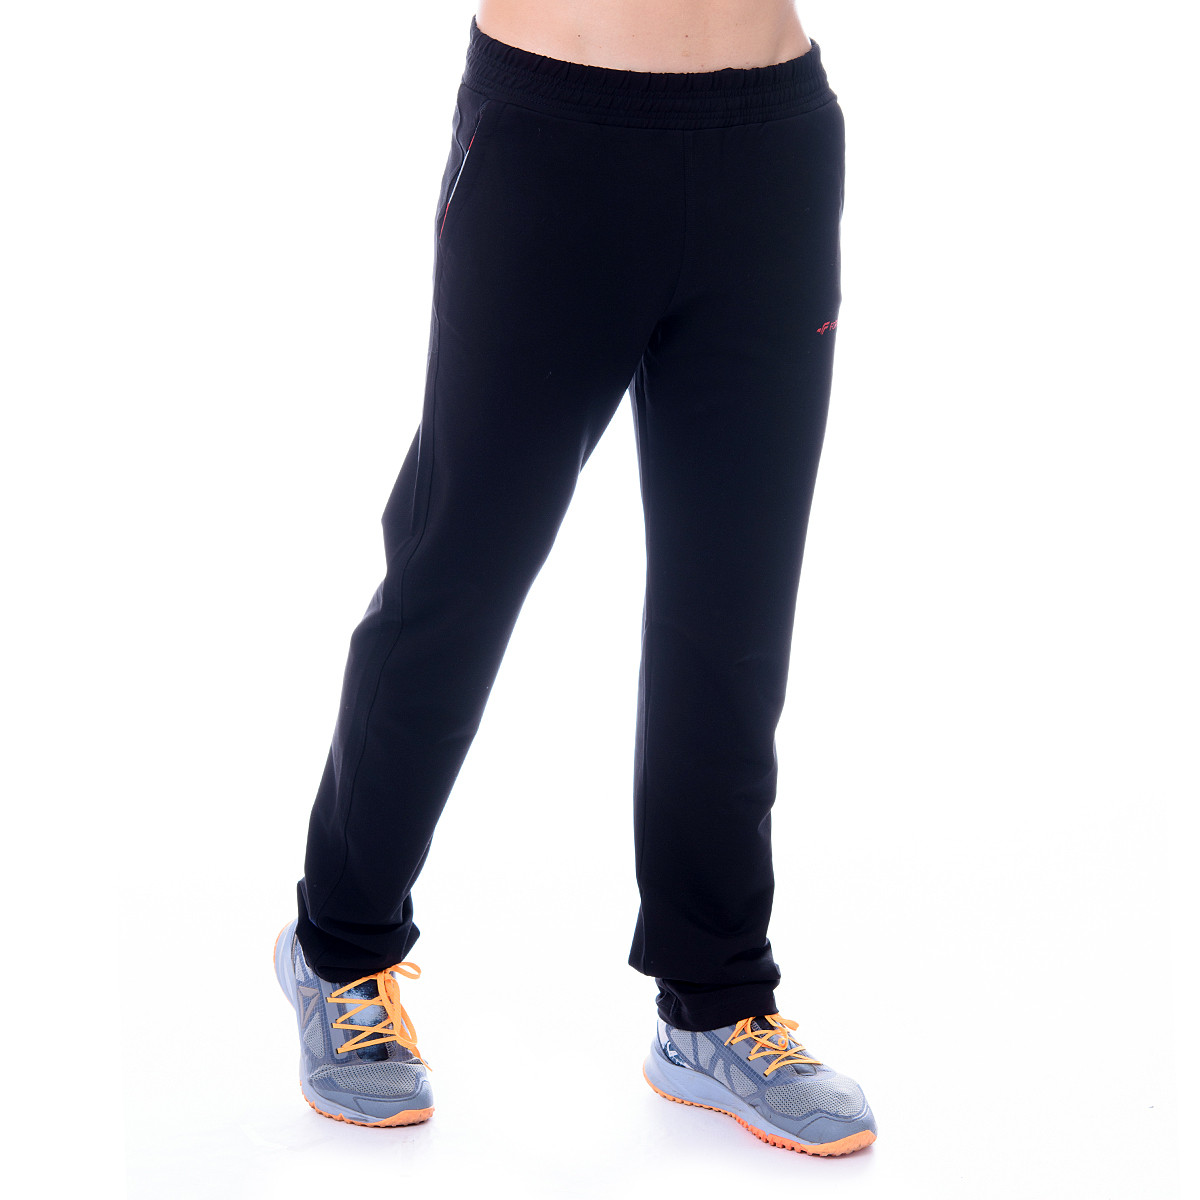 Мужские спортивные штаны трикотаж   тм. FORE  9284